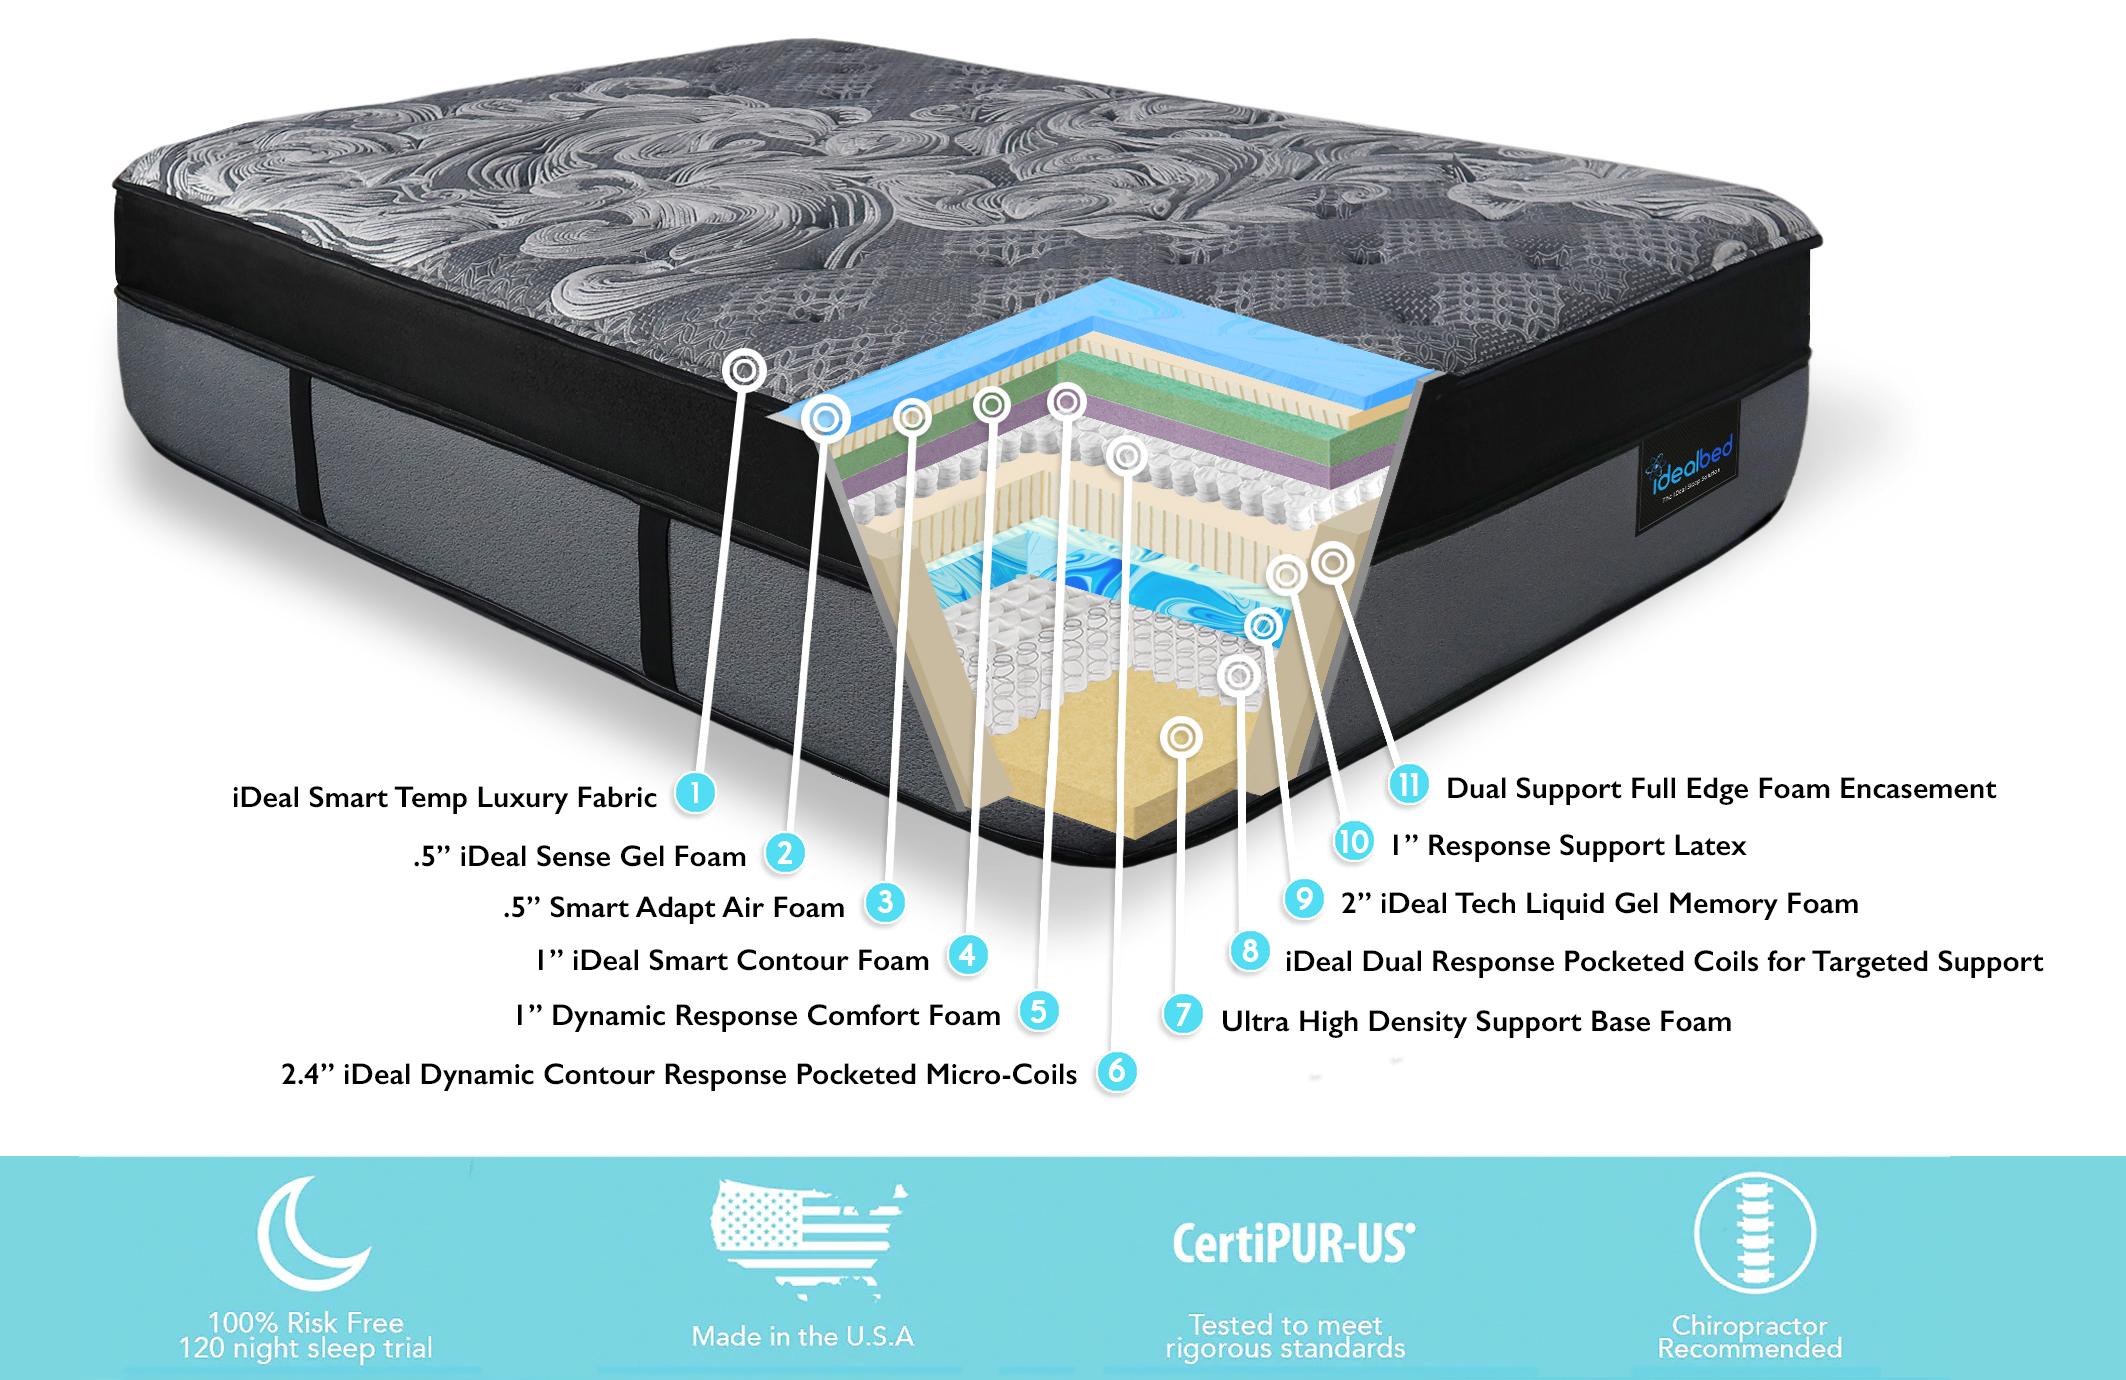 iQ7 Specifications Cutaway